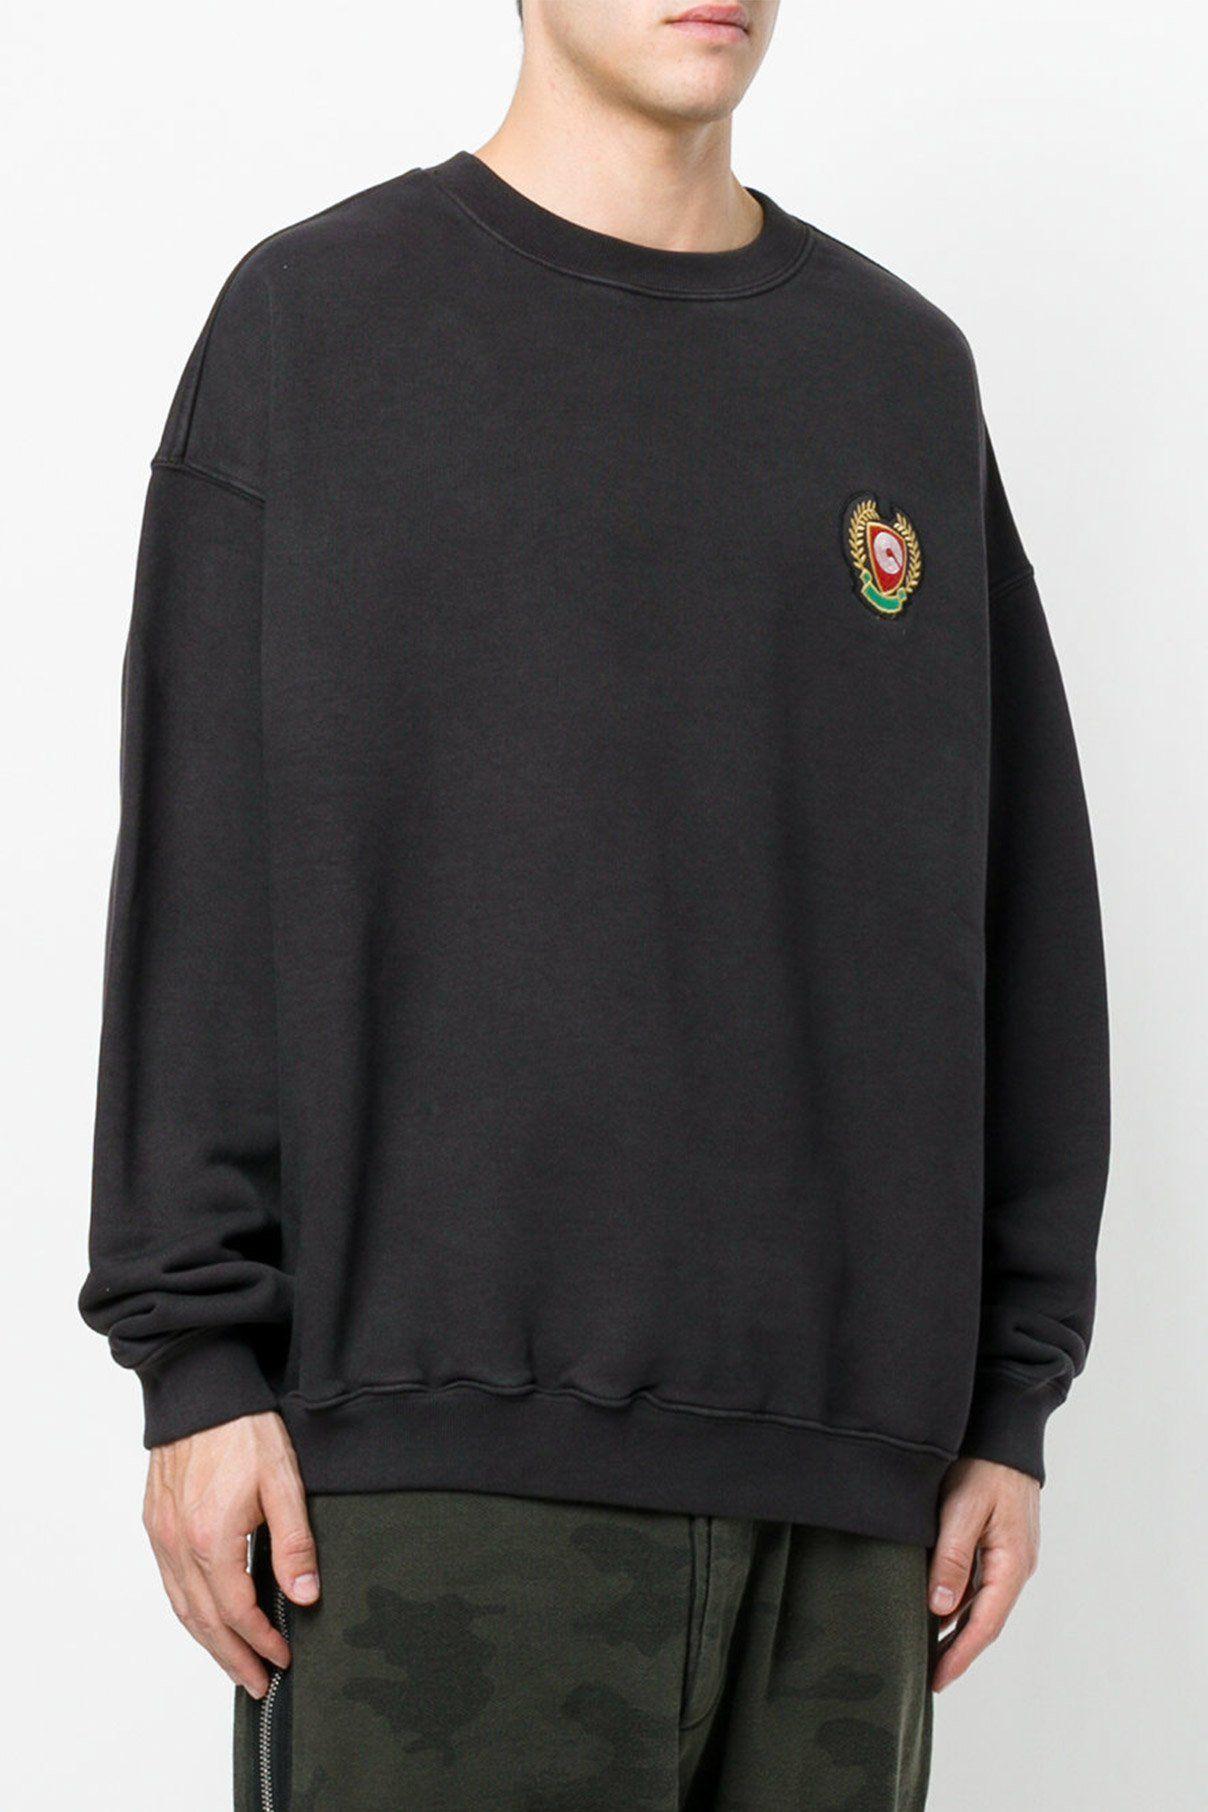 Yeezy Season 5 Crew Neck Sweatshirt Mens Sweatshirts Crew Neck Sweatshirt Sweatshirts [ 1812 x 1208 Pixel ]